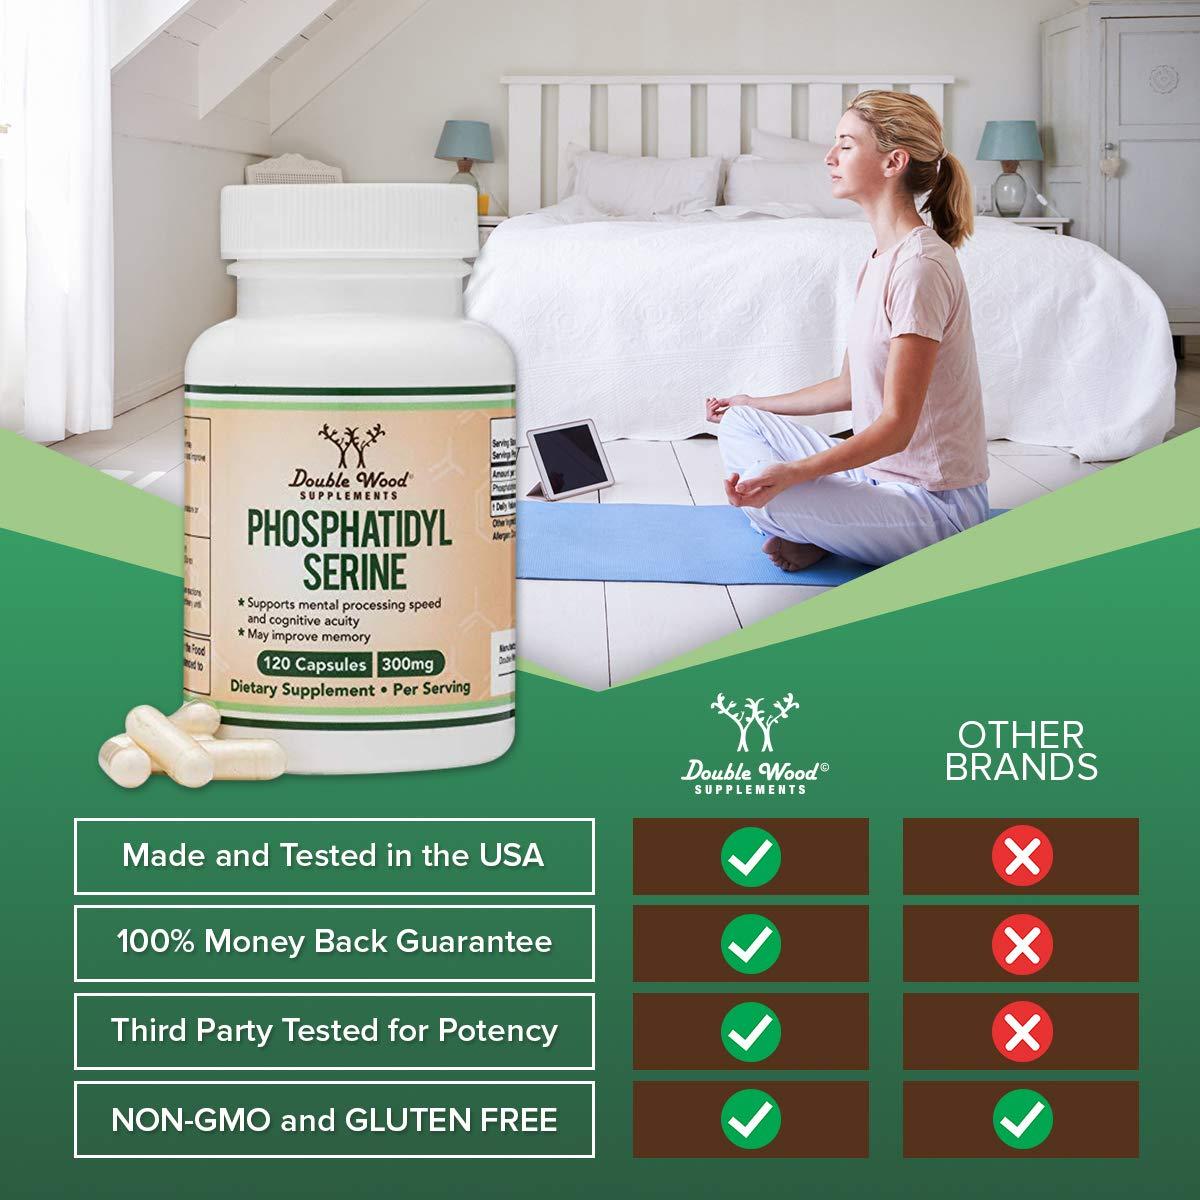 PhosphatidylSerine 300mg Per Serving, Made in The USA, 120 Capsules (Phosphatidyl Serine Complex) by Double Wood Supplements by Double Wood Supplements (Image #5)